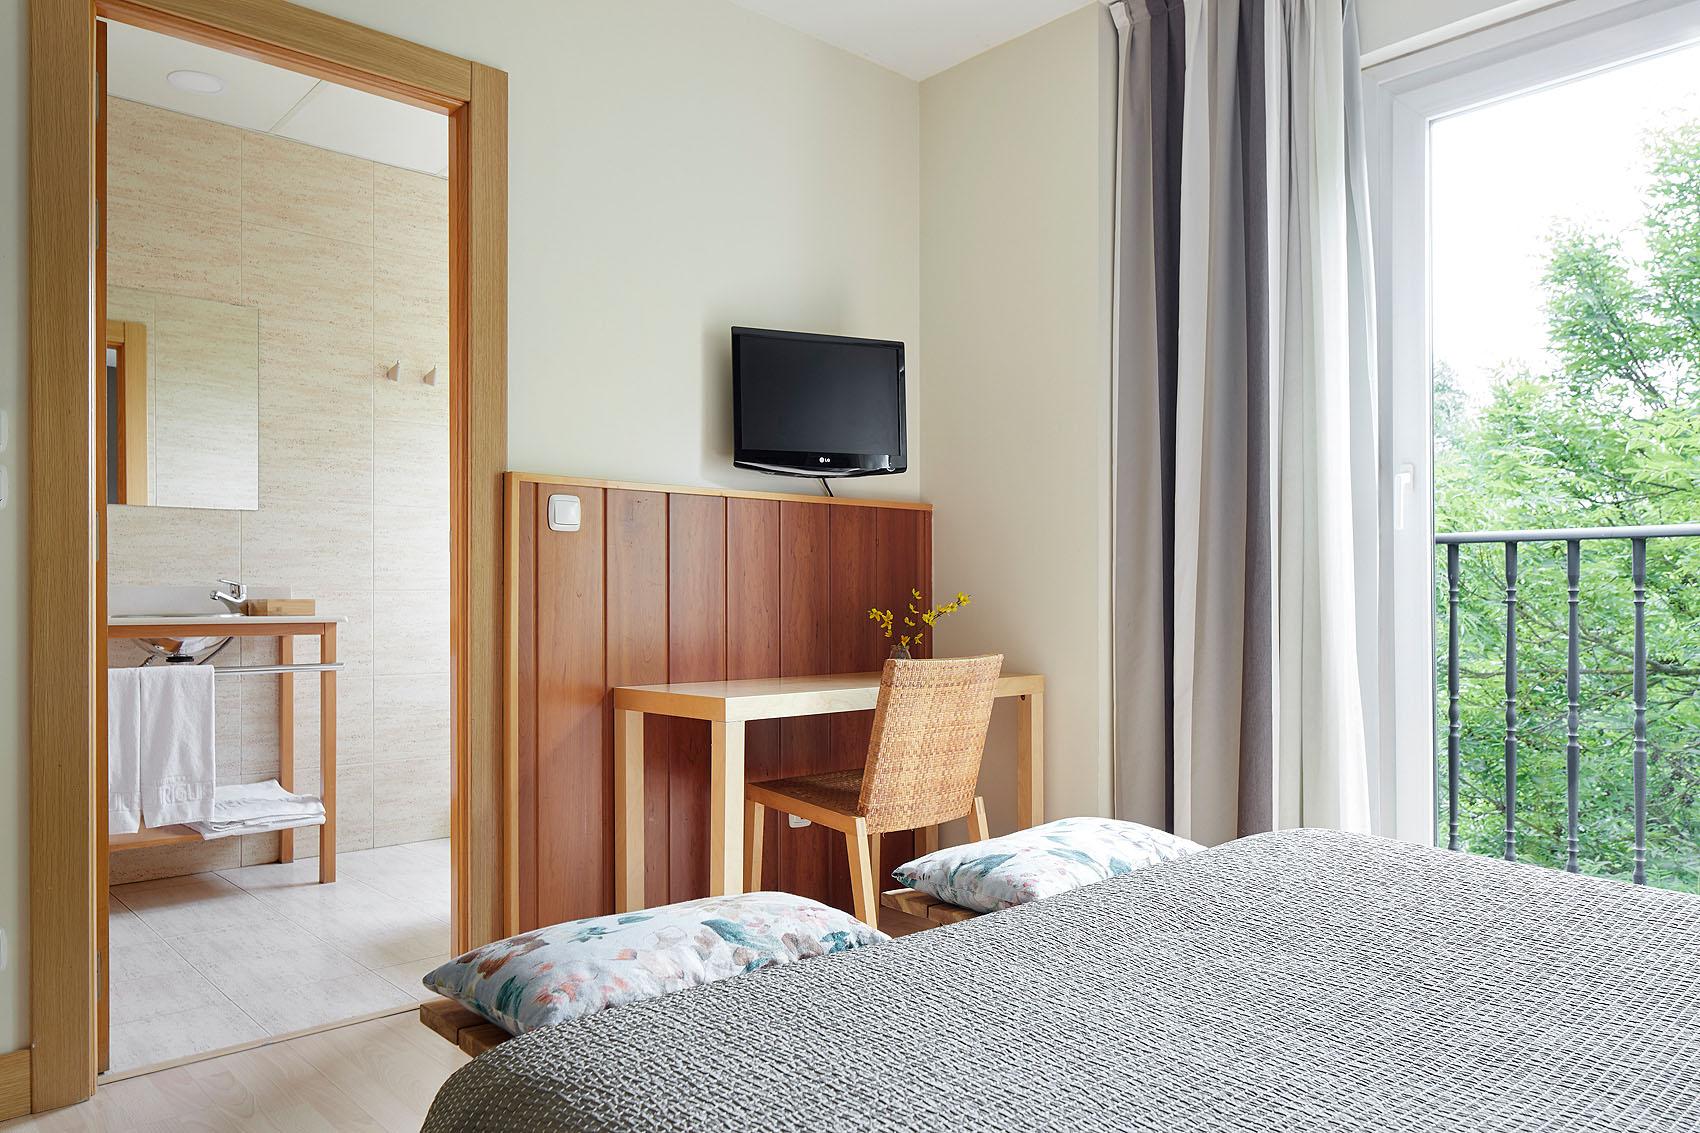 Hotel Iriguibel - Iñaki Caperochipi - Fotografía